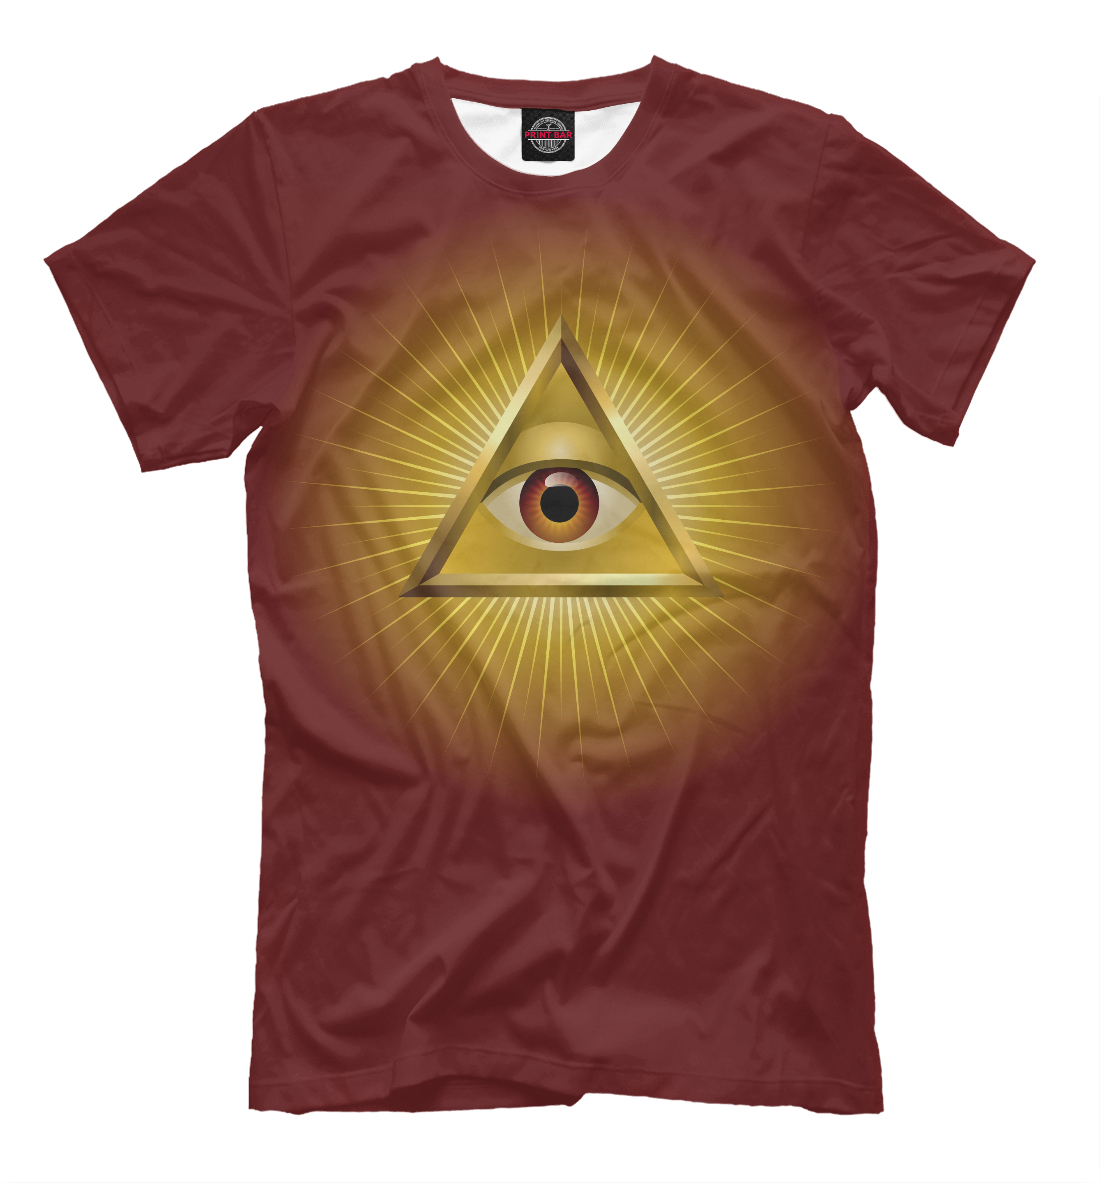 Illuminati, Printbar, Футболки, APD-438186-fut-2  - купить со скидкой